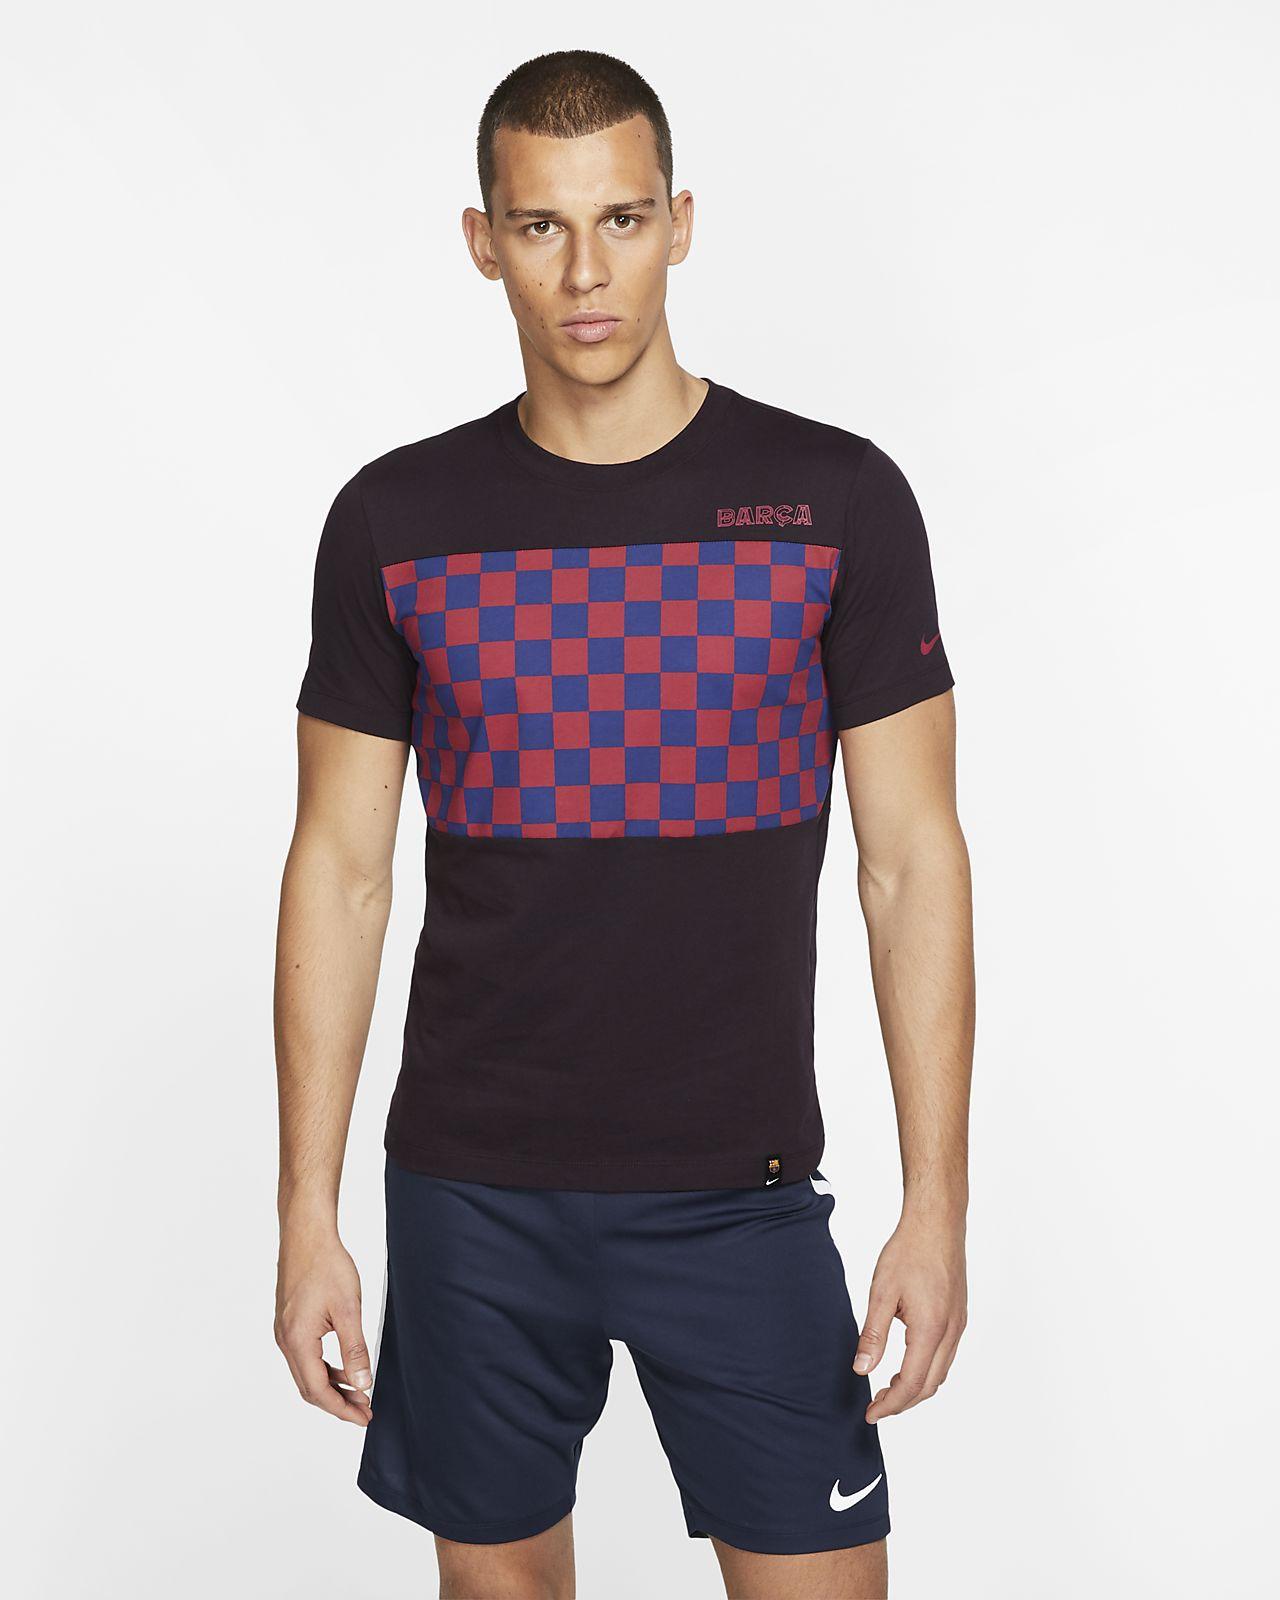 FC Barcelona Herren-T-Shirt